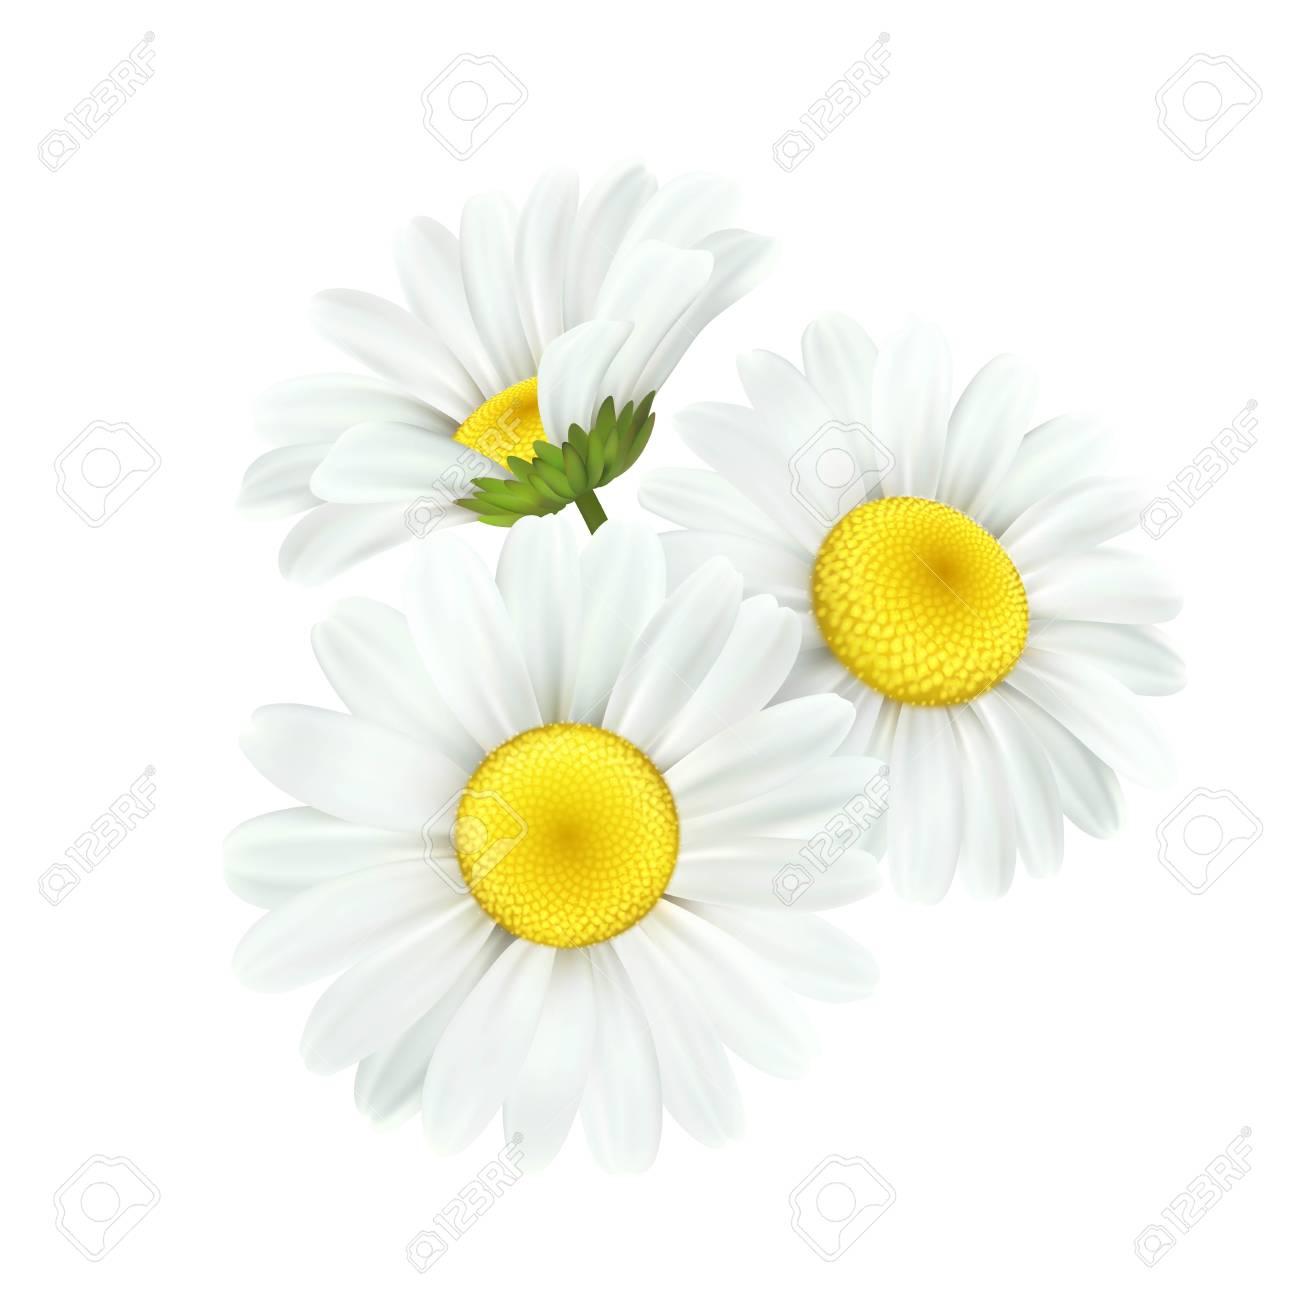 Chamomile daisy flower isolated on white background. Vector illustration EPS10 - 116149008